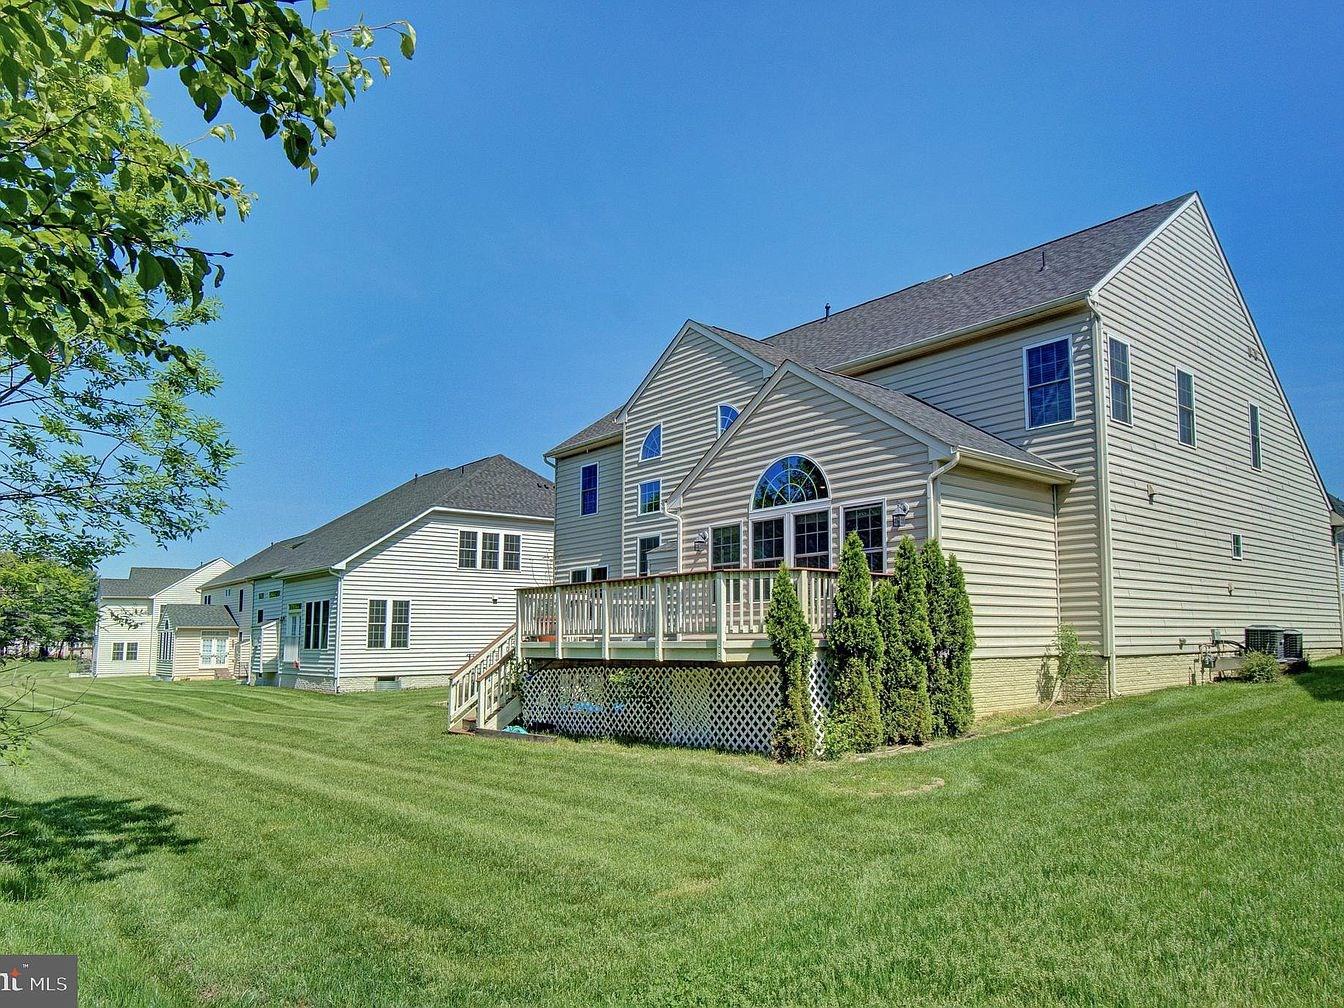 Find basement Apartment for Rent in Ashburn, VA | Sulekha